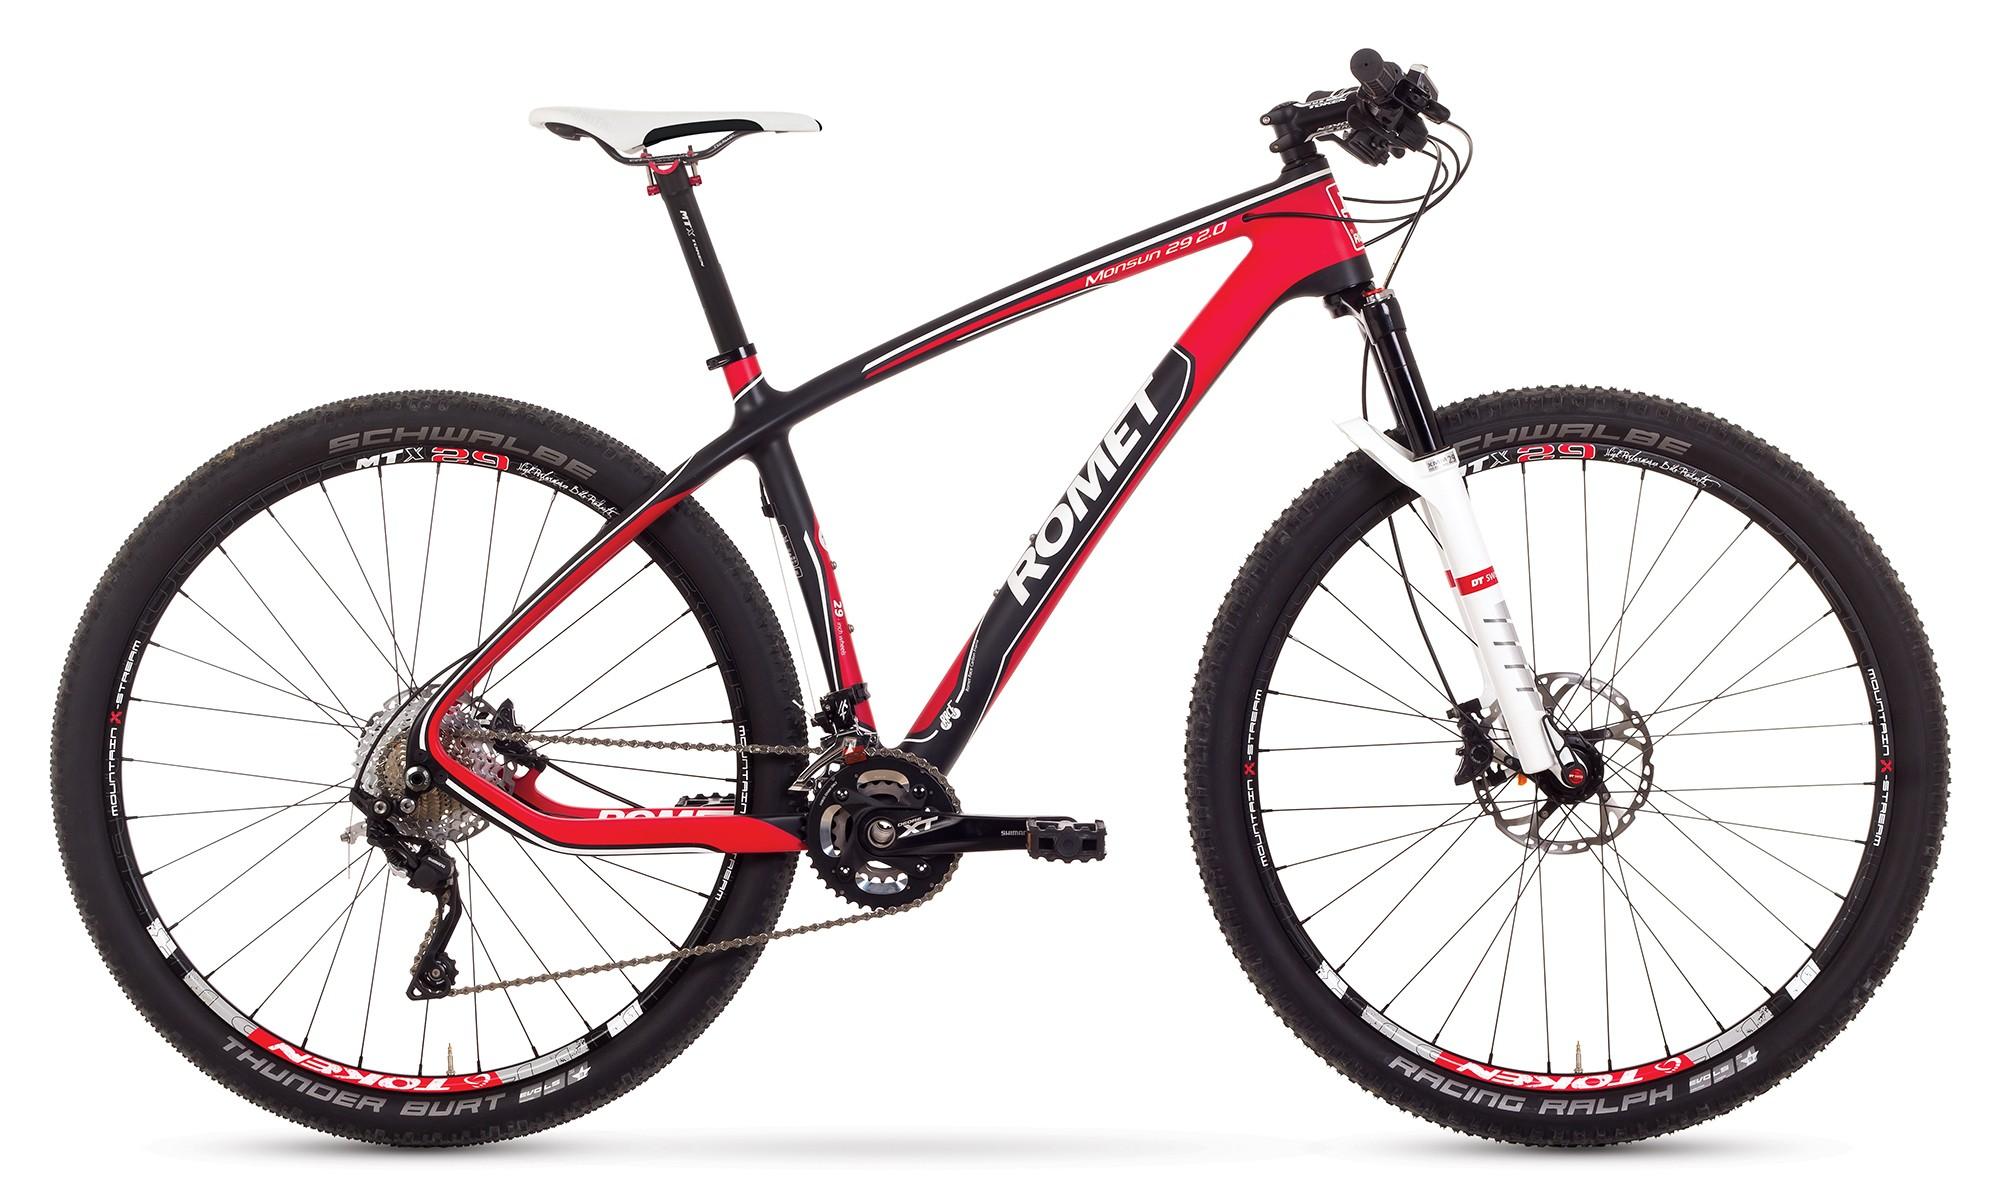 Bicicleta MTB Romet Monsun 29 2.0 - negru-rosu